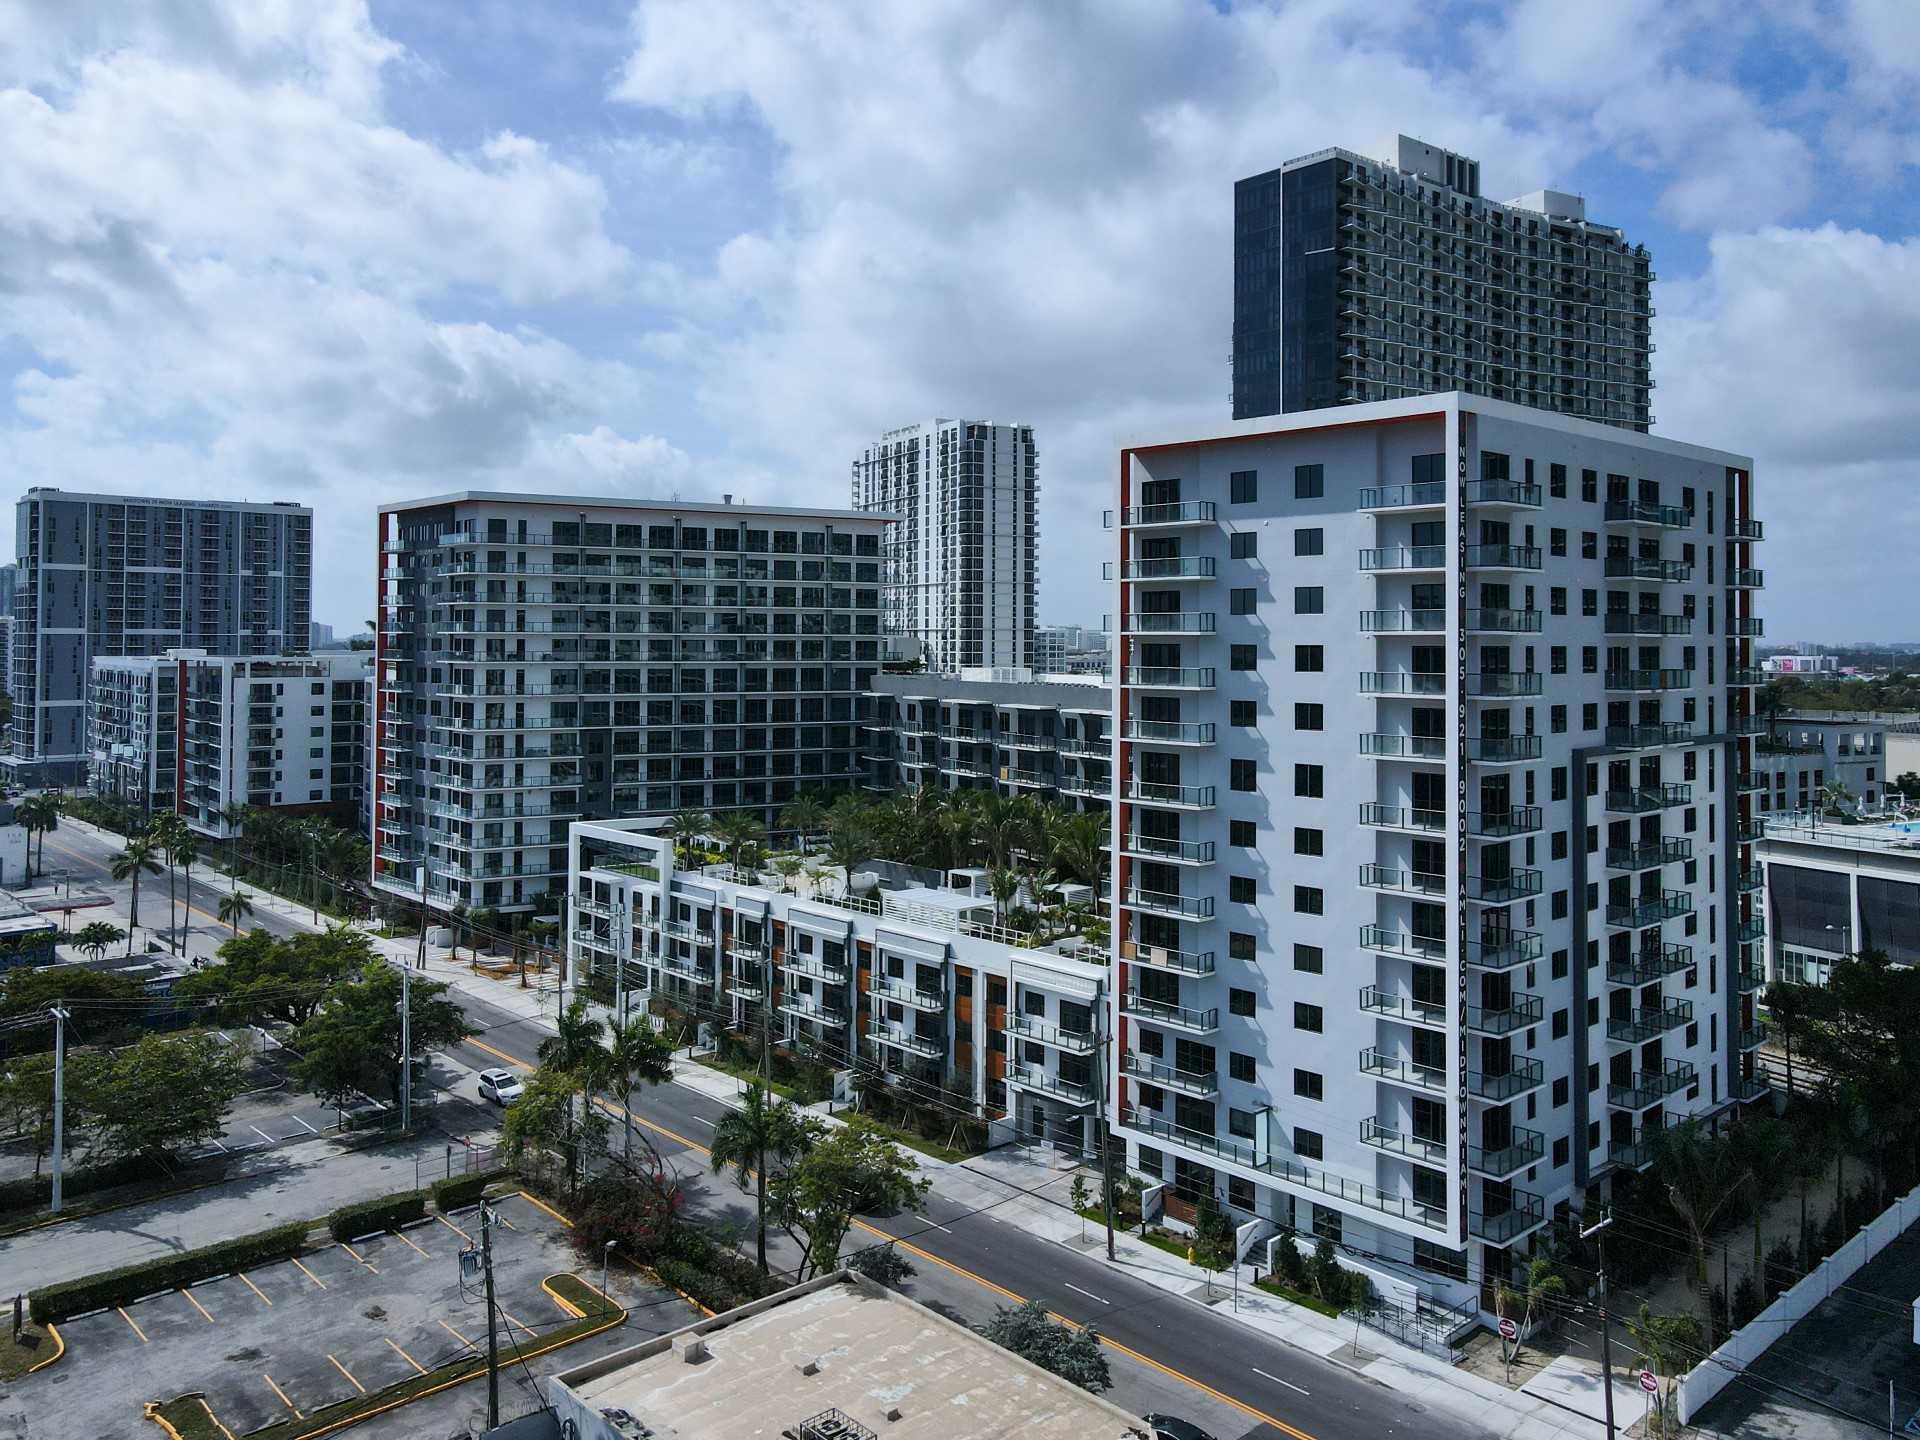 AMLI Chiquita at Midtown Miami